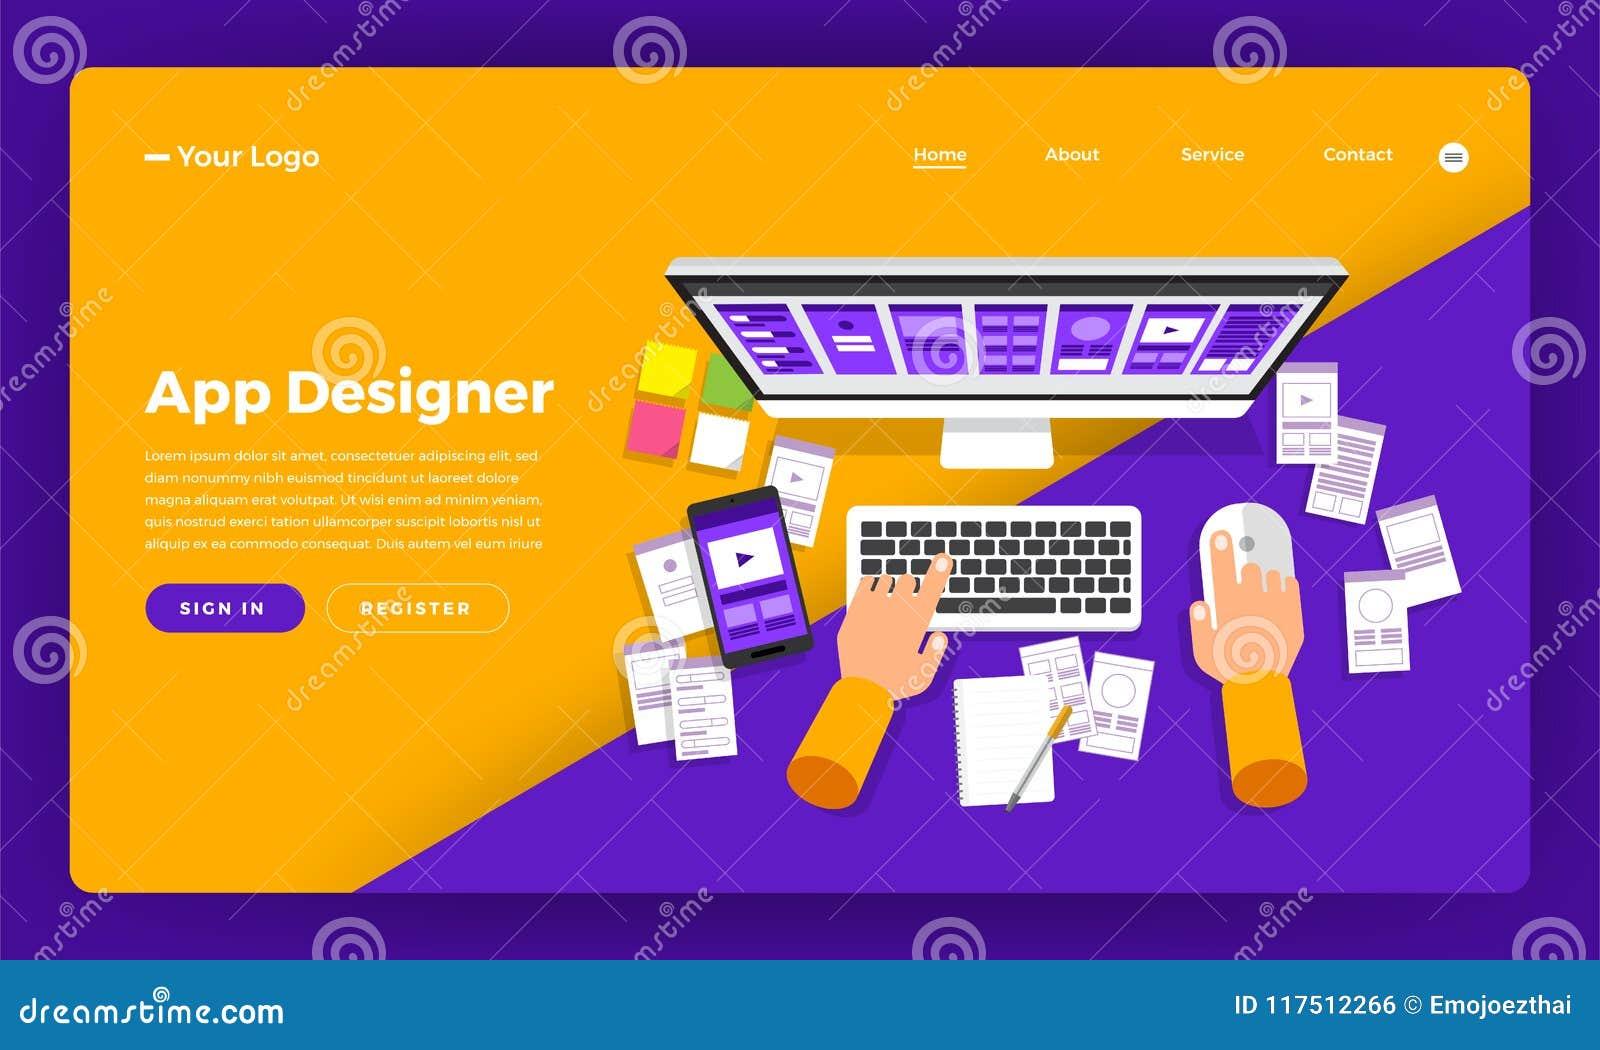 App έννοιας σχεδίου ιστοχώρου σχεδίου προτύπων ο επίπεδος σχεδιαστής δημιουργεί το α